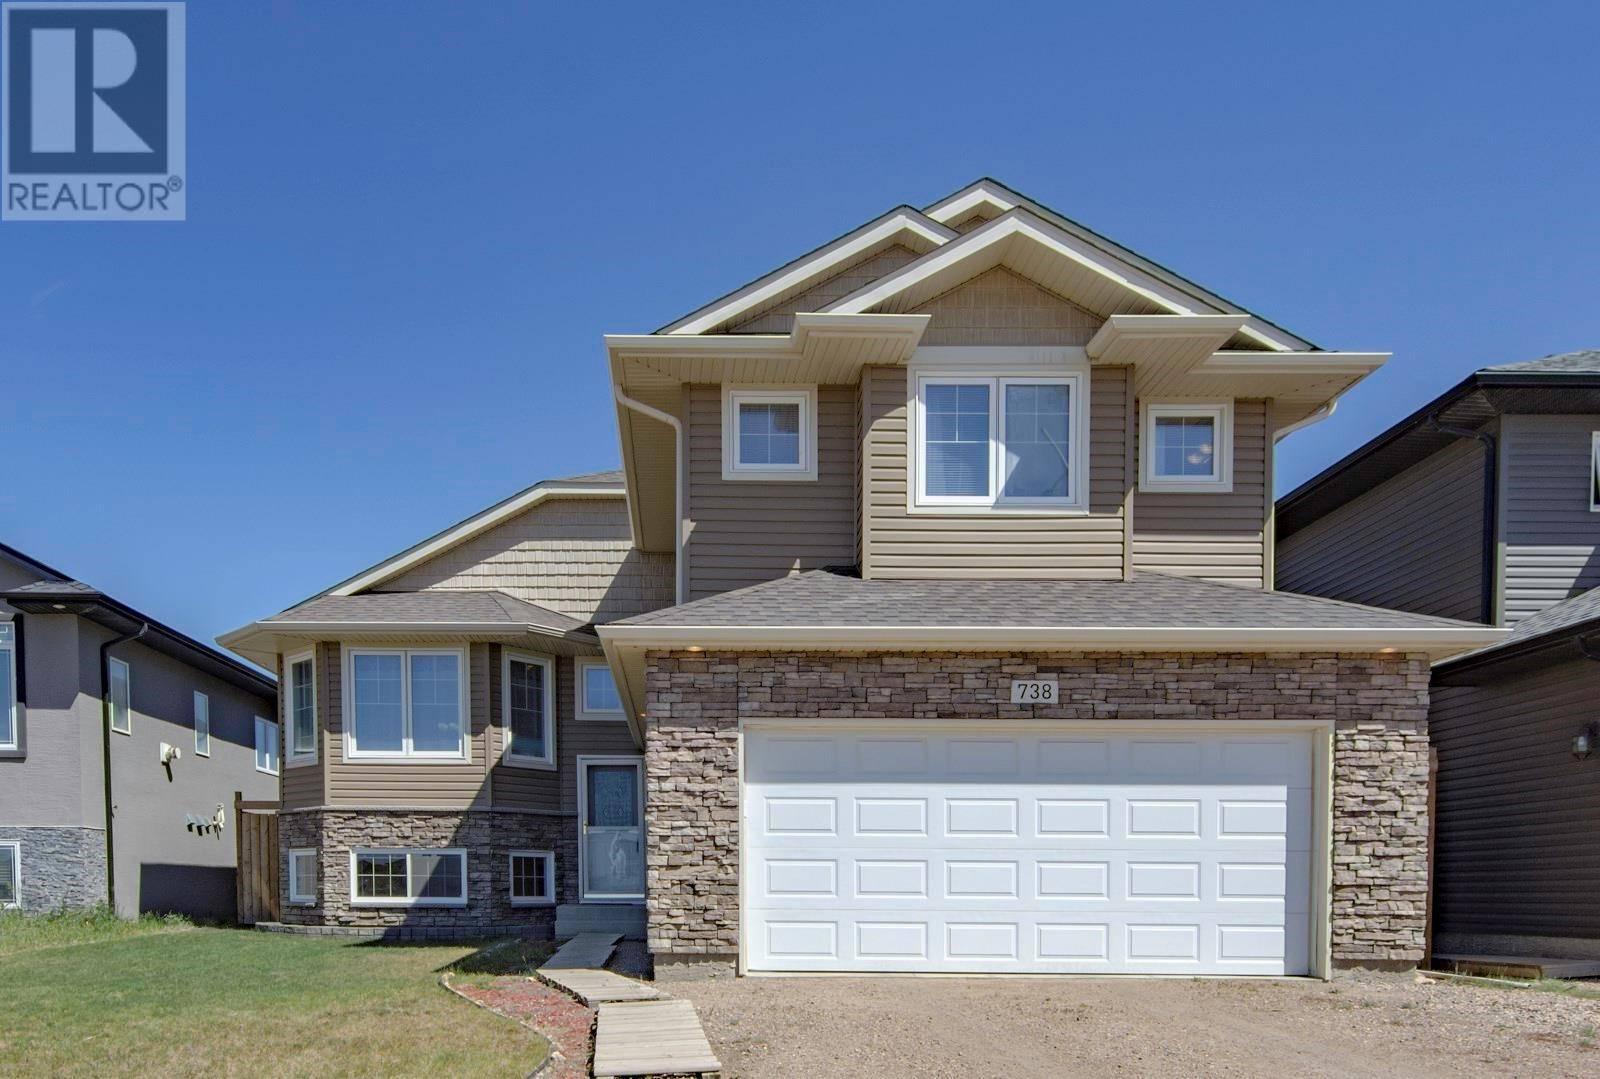 House for sale at 738 Evergreen Blvd Saskatoon Saskatchewan - MLS: SK788221